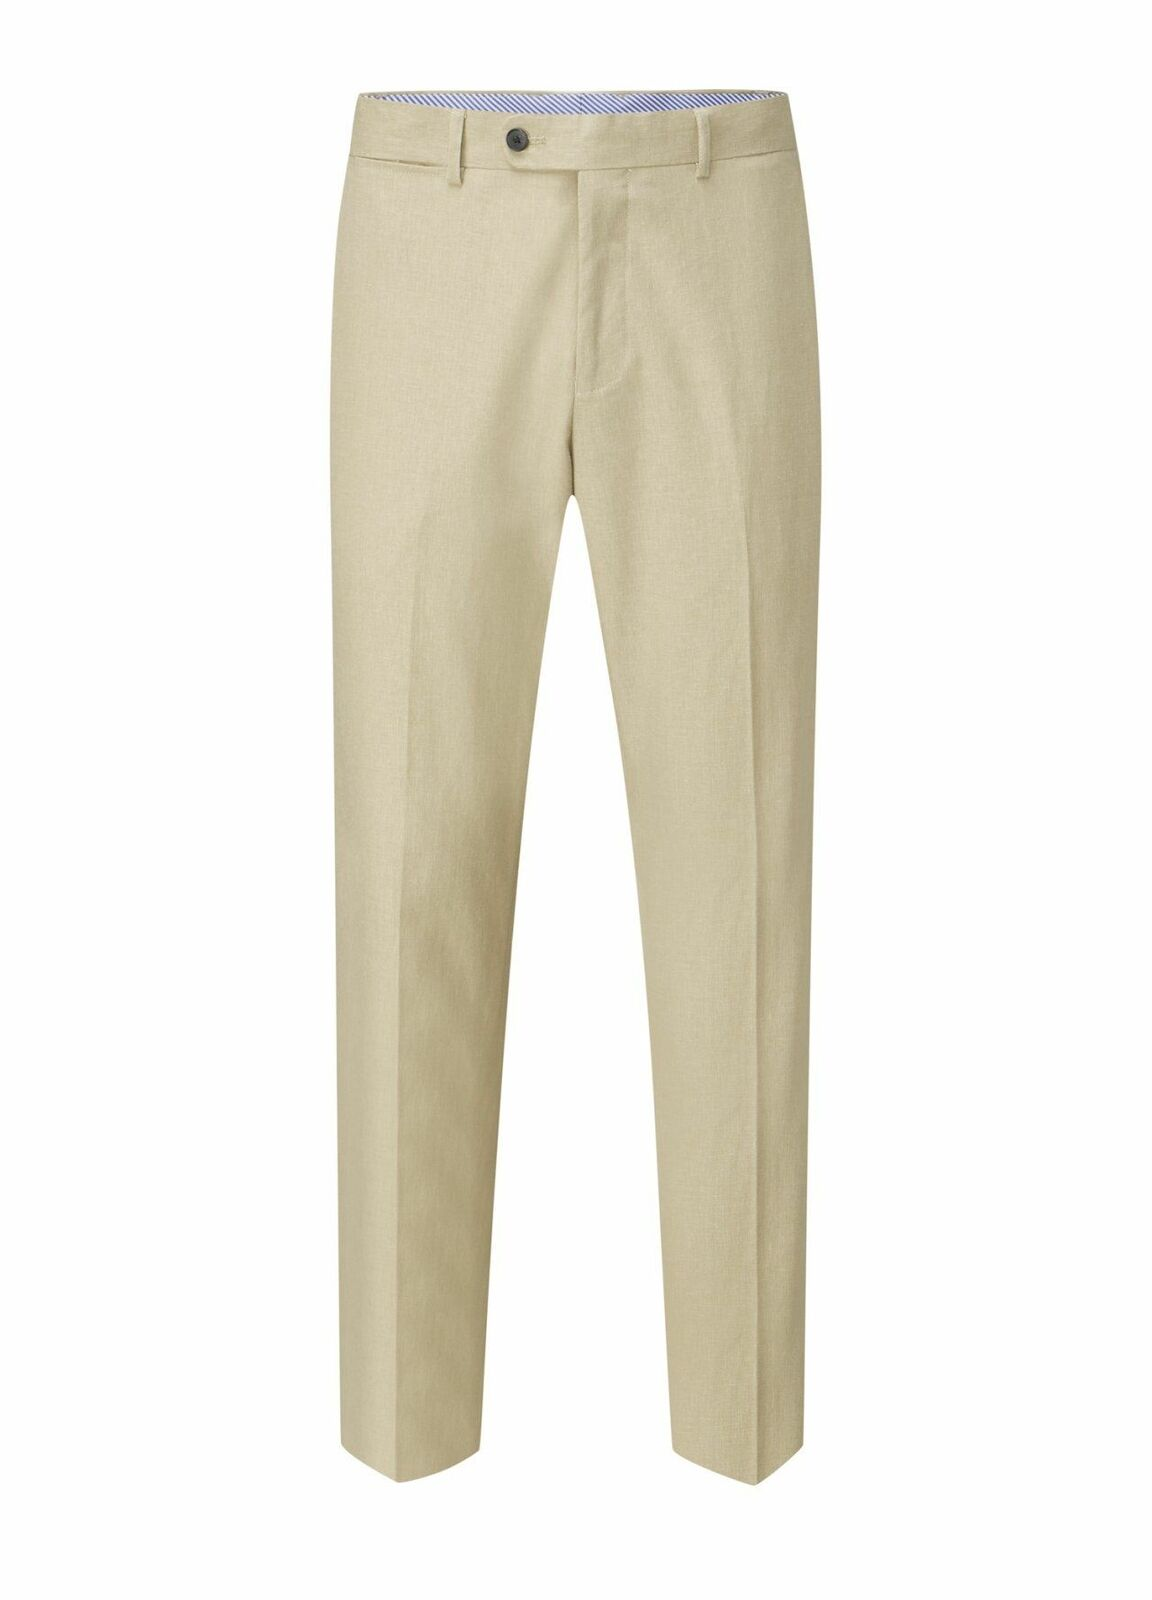 SKOPES Mens Linen Blend Suit Trousers in Stone (Morant)